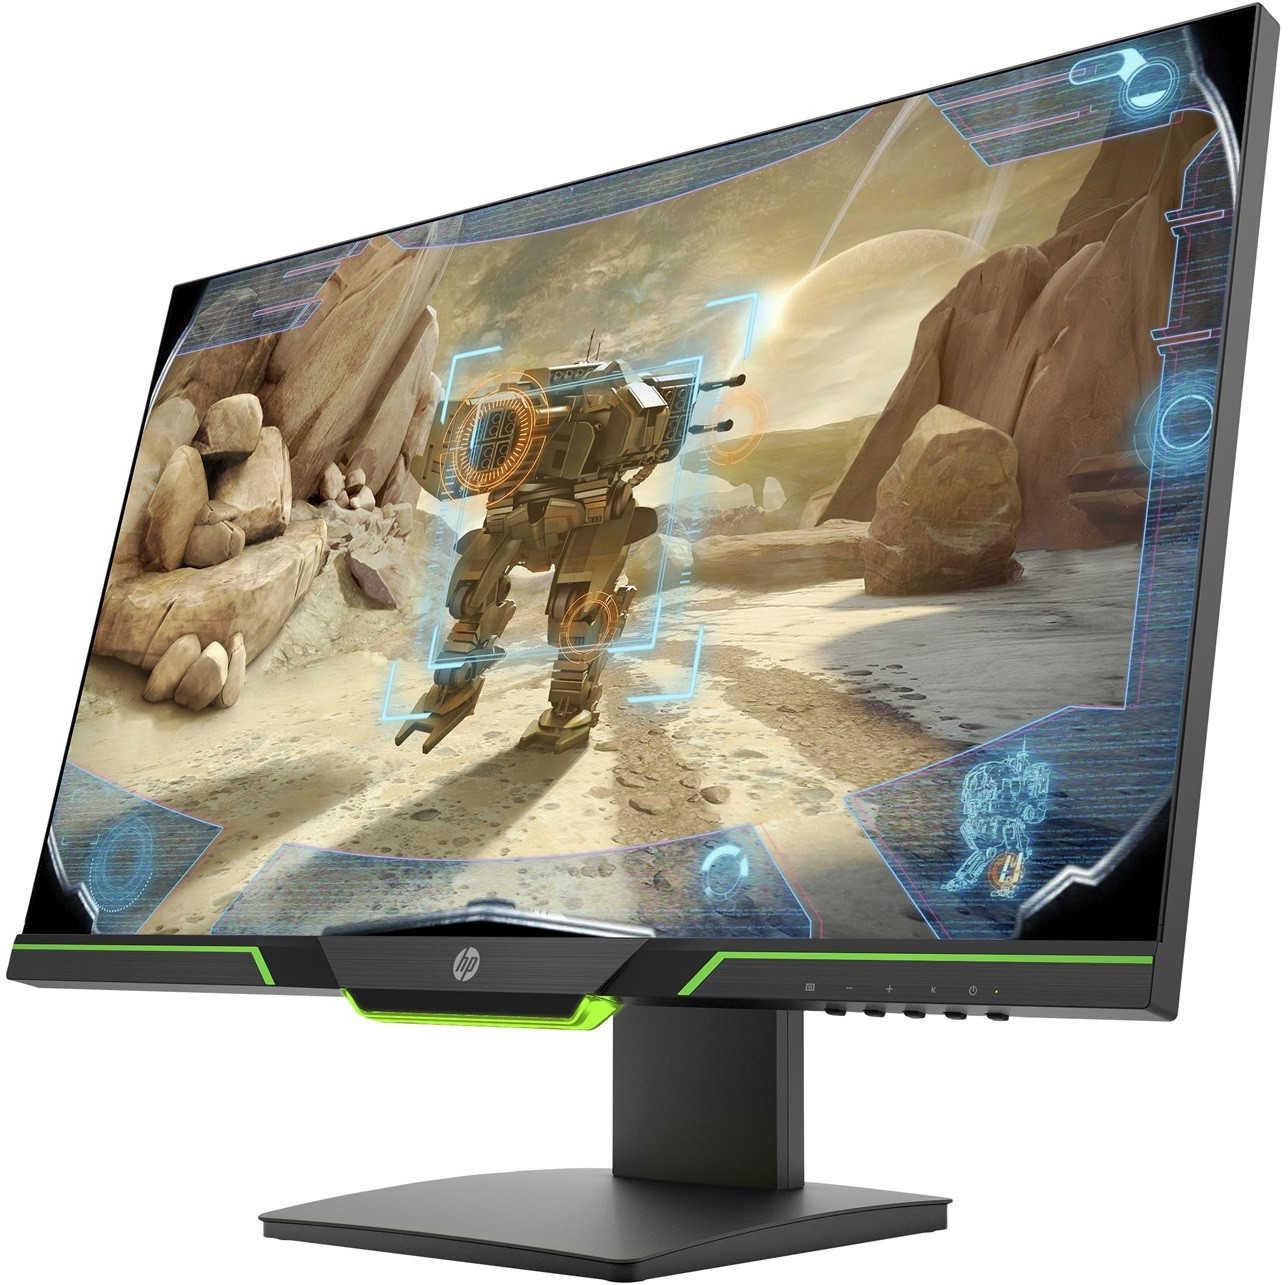 hp 27xq 69 cm 27 zoll led qhd gaming monitor fuer 27920 e statt 36025 e